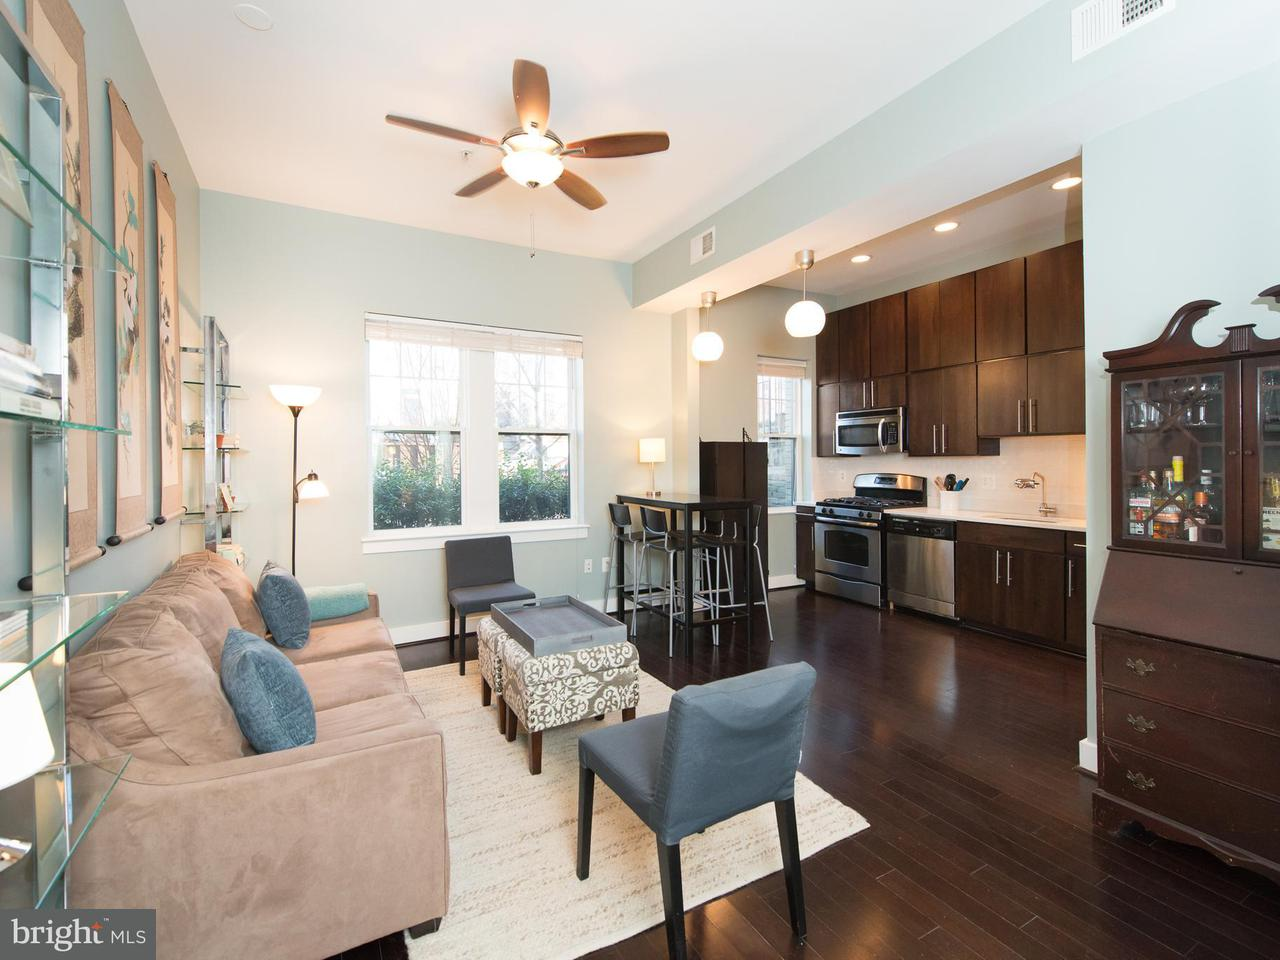 Condominium for Sale at 315 G St NE #102 Washington, District Of Columbia 20002 United States